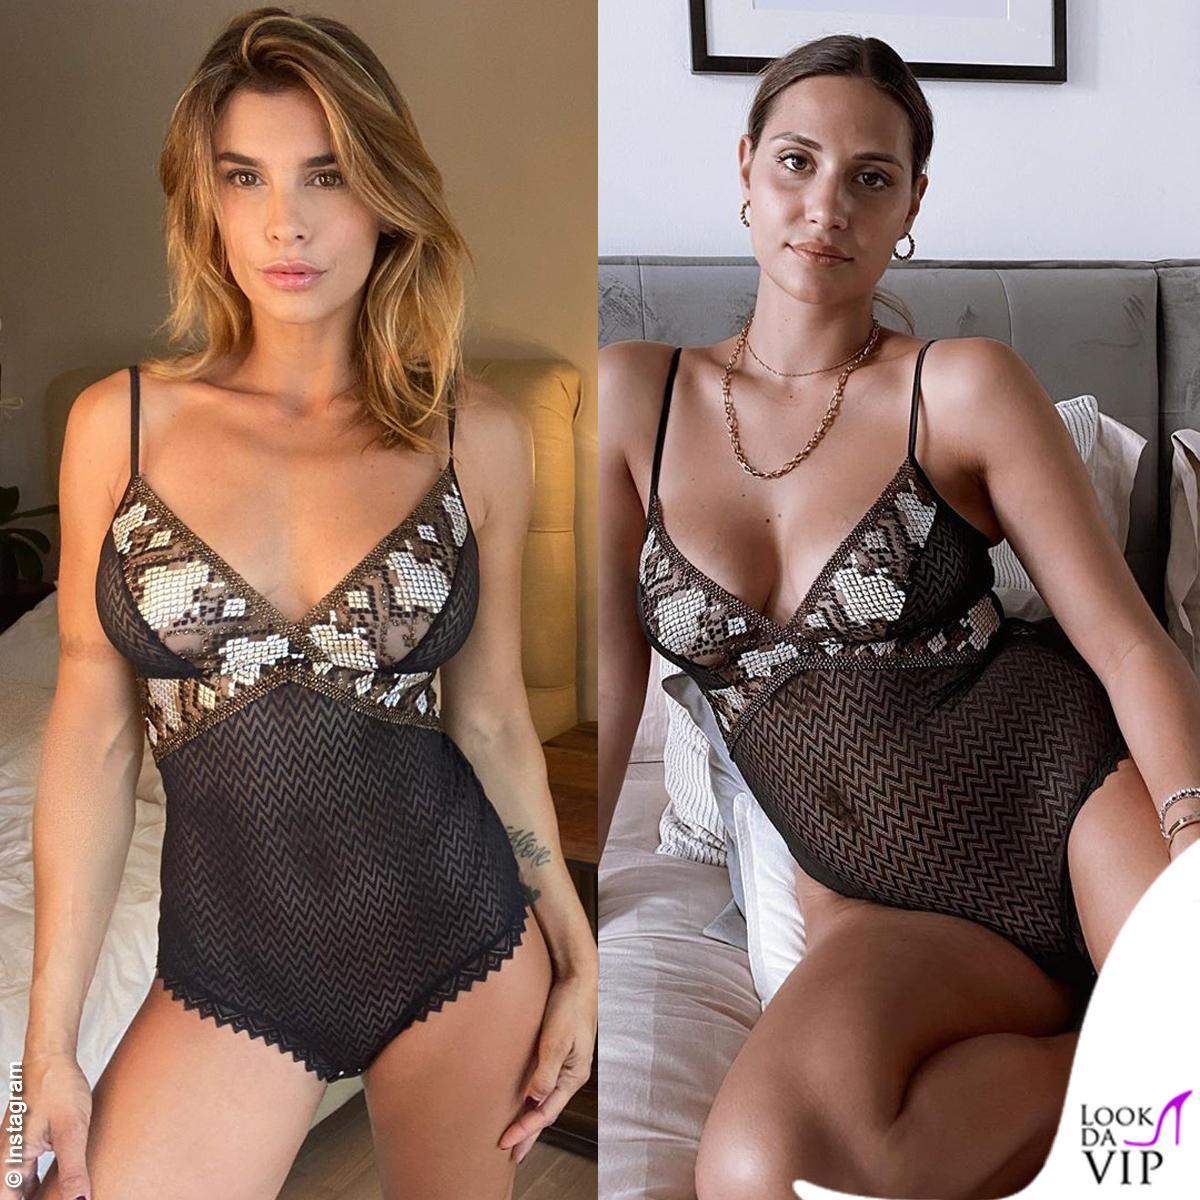 Elisabetta Canalis e Beatrice Valli: stessa lingerie, seduzione differente